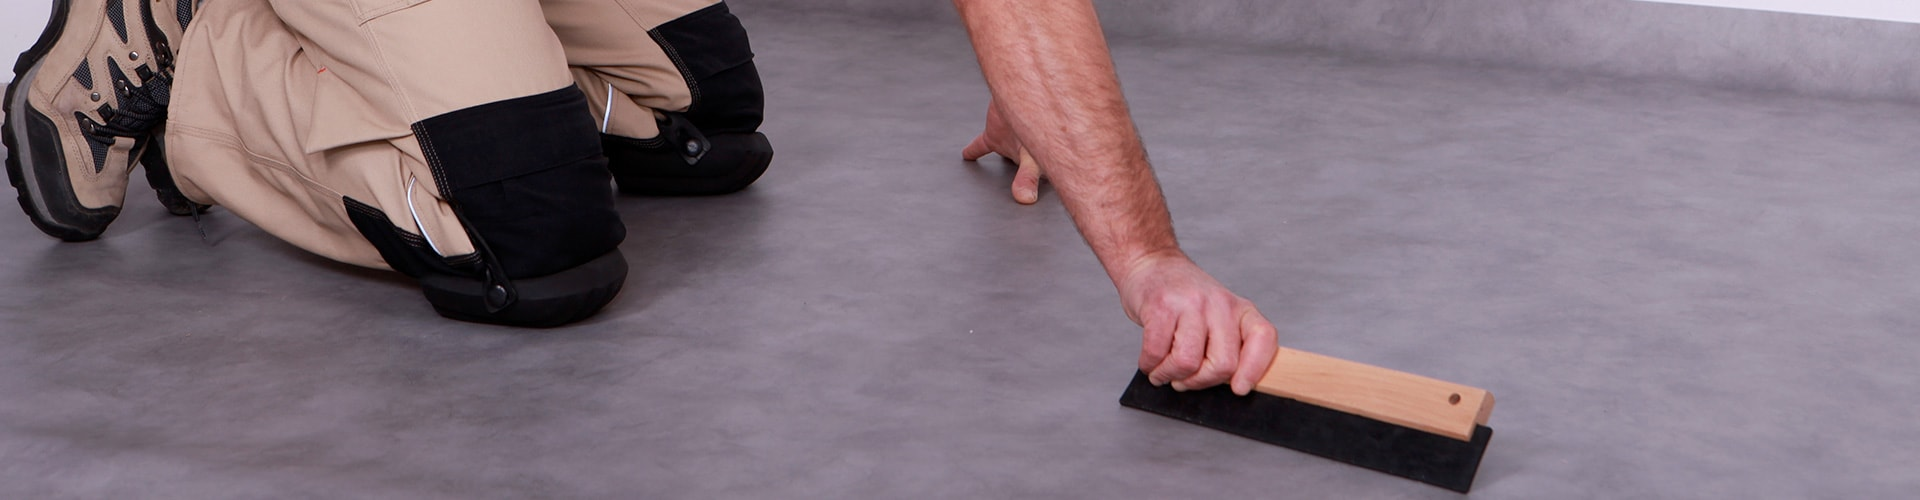 Pose de lino : avantages du revêtement de sol en linoléum  Mesdevis